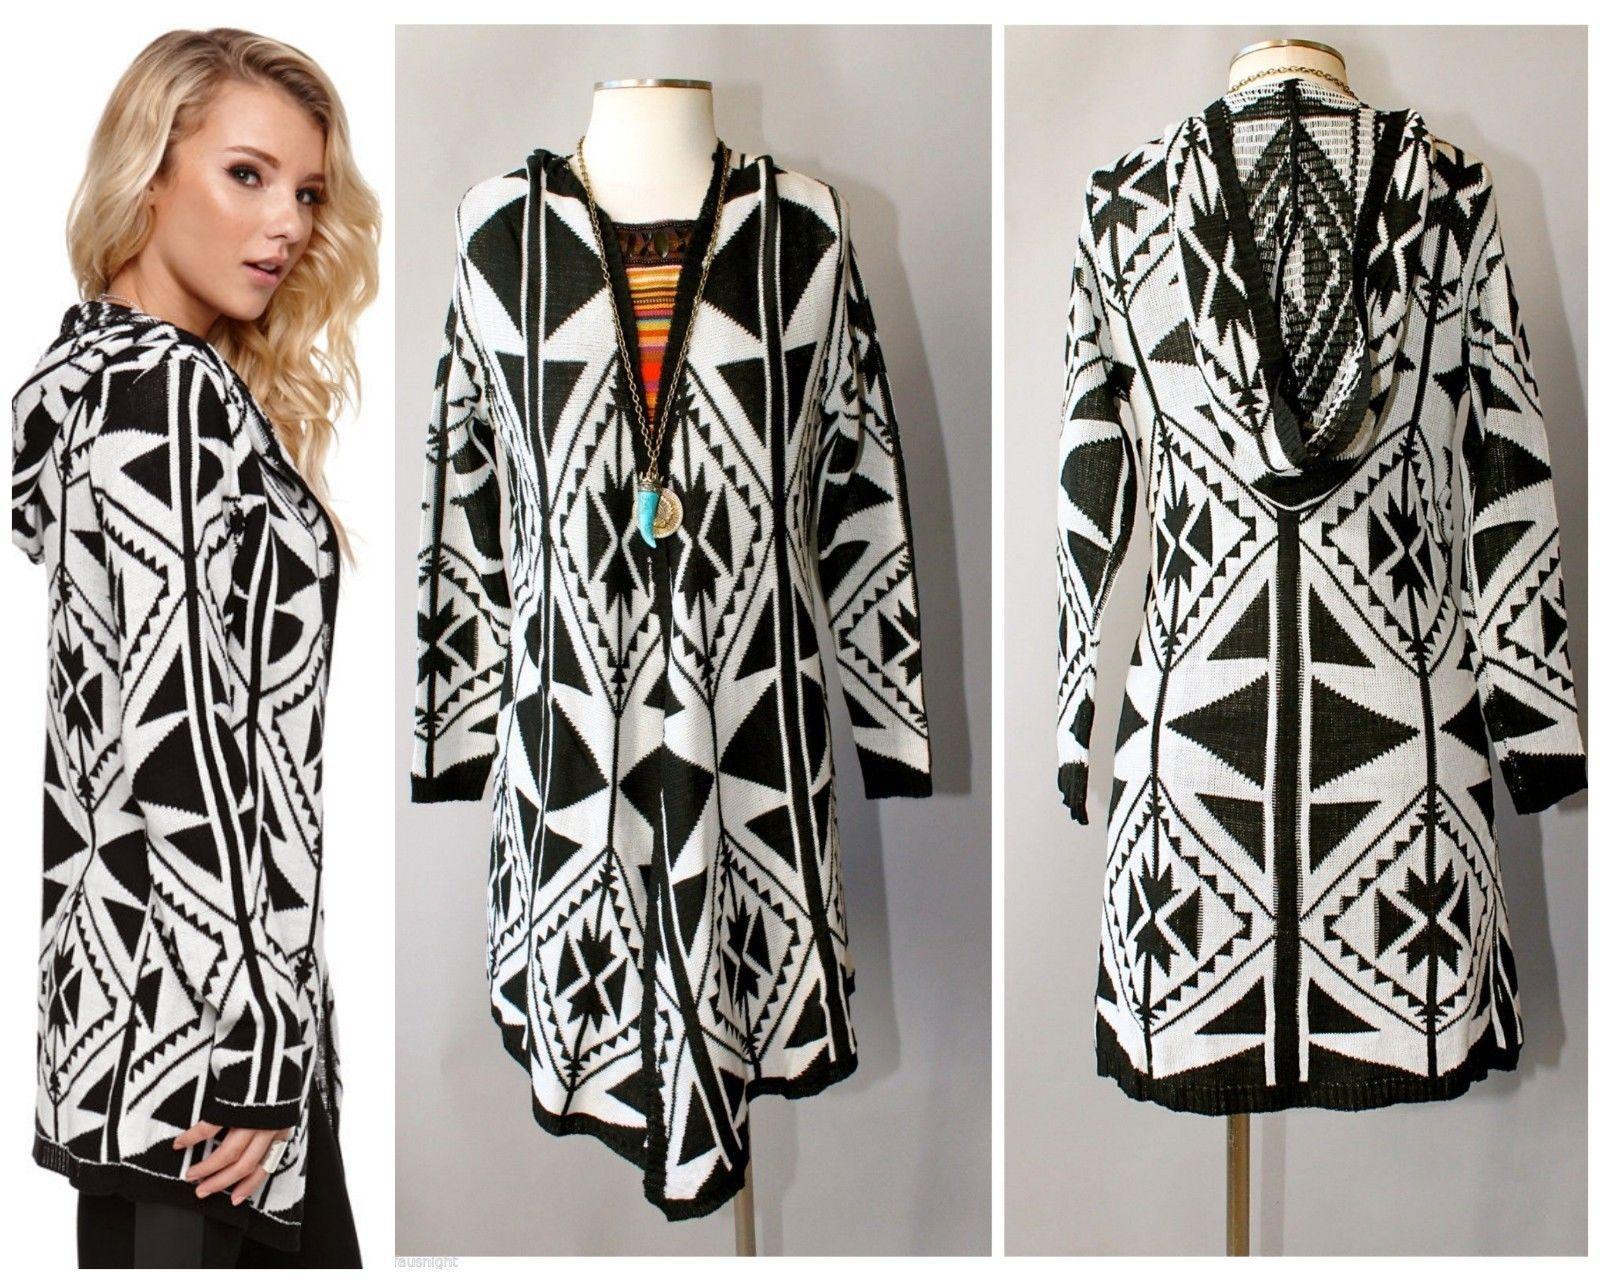 Tribal hooded maxi cardigan black ivory high end quality b.sharp ...